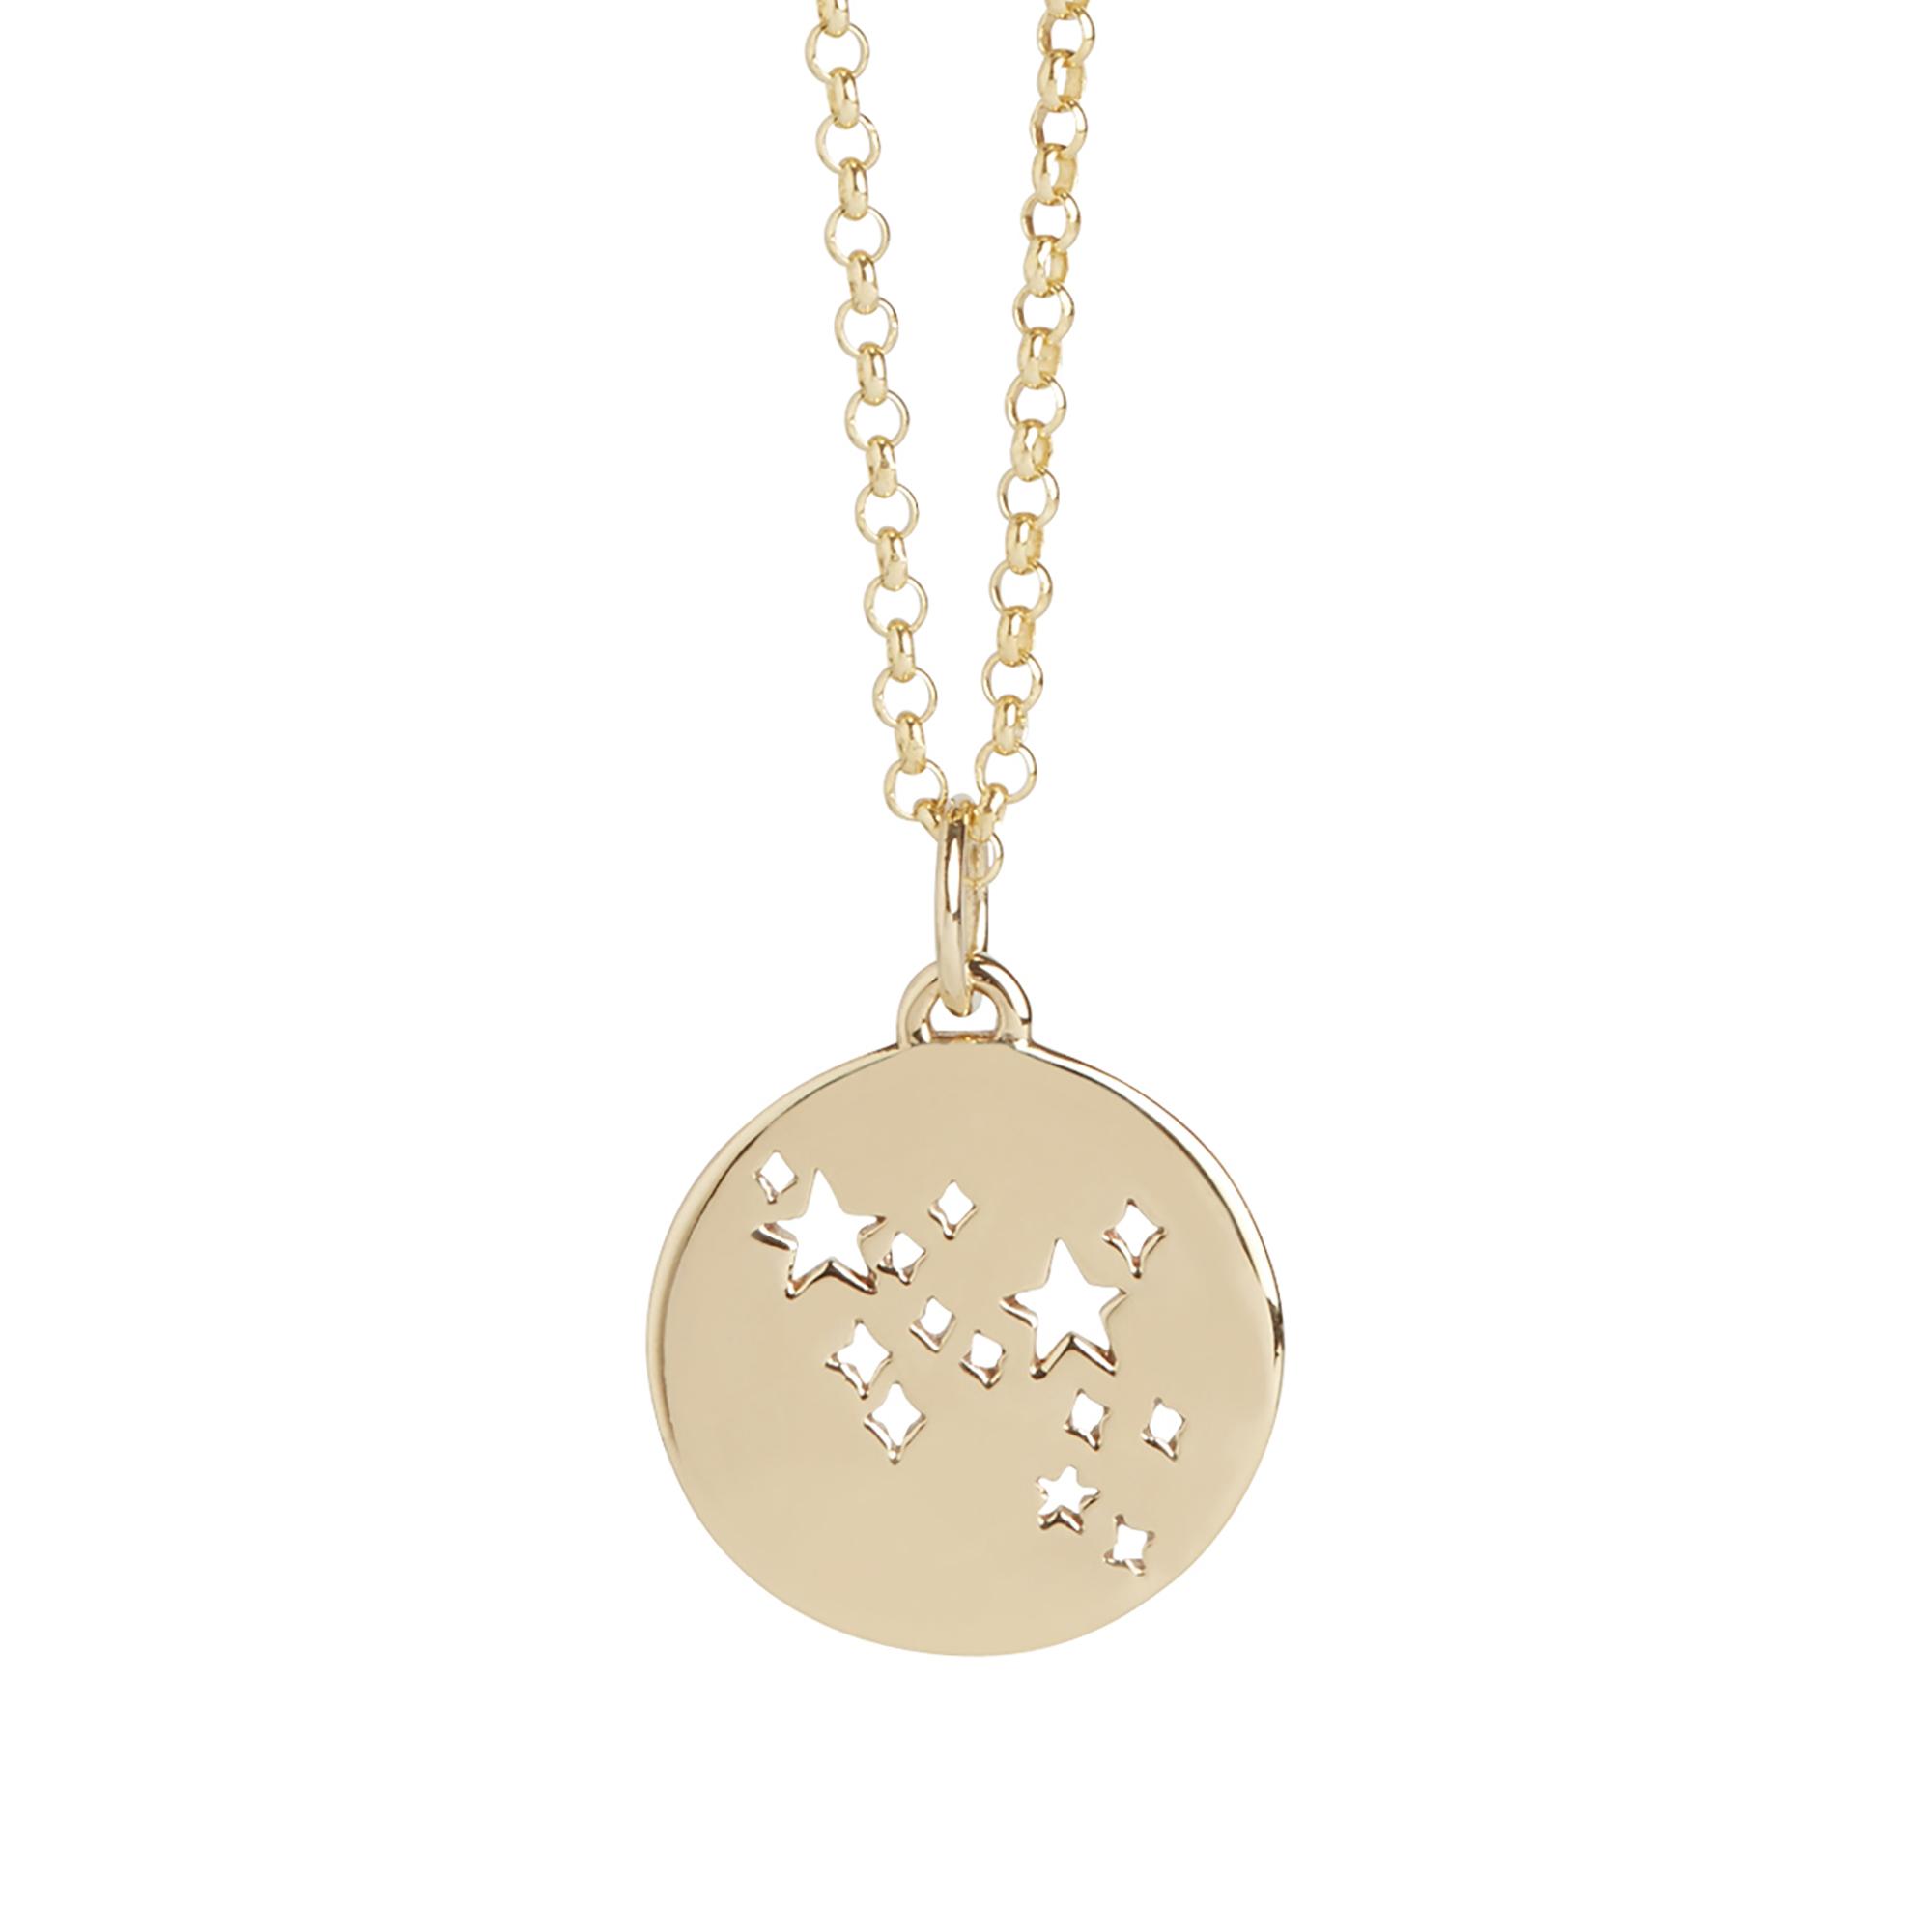 Muru Sagittarius Star Sign Necklace Gold Plated